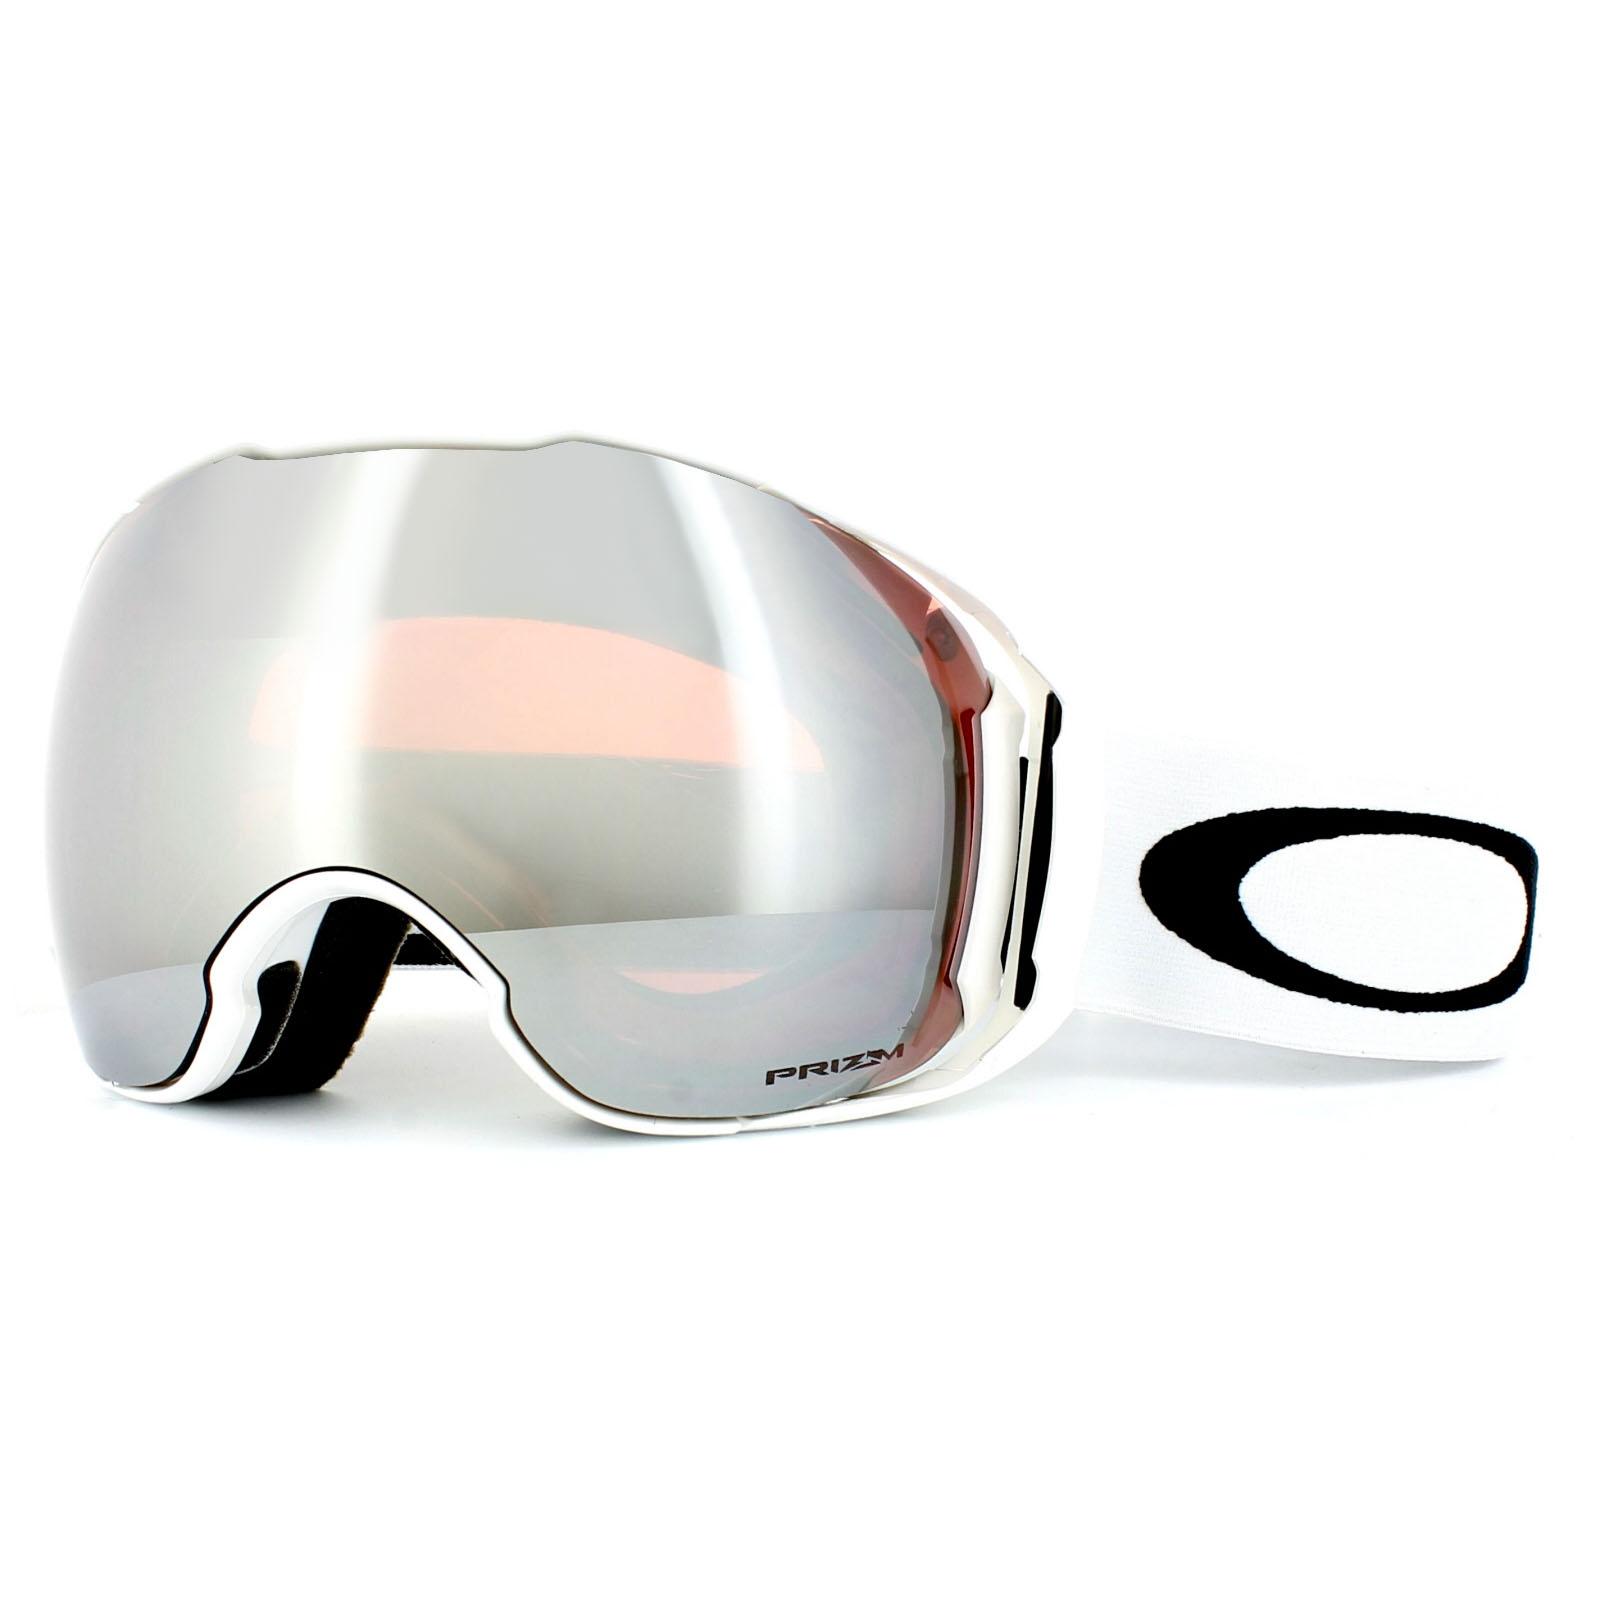 white oakley ski goggles atru  Sentinel Oakley Ski Goggles Airbrake XL OO7071-12 White Prizm Black & Prizm  HI Pink